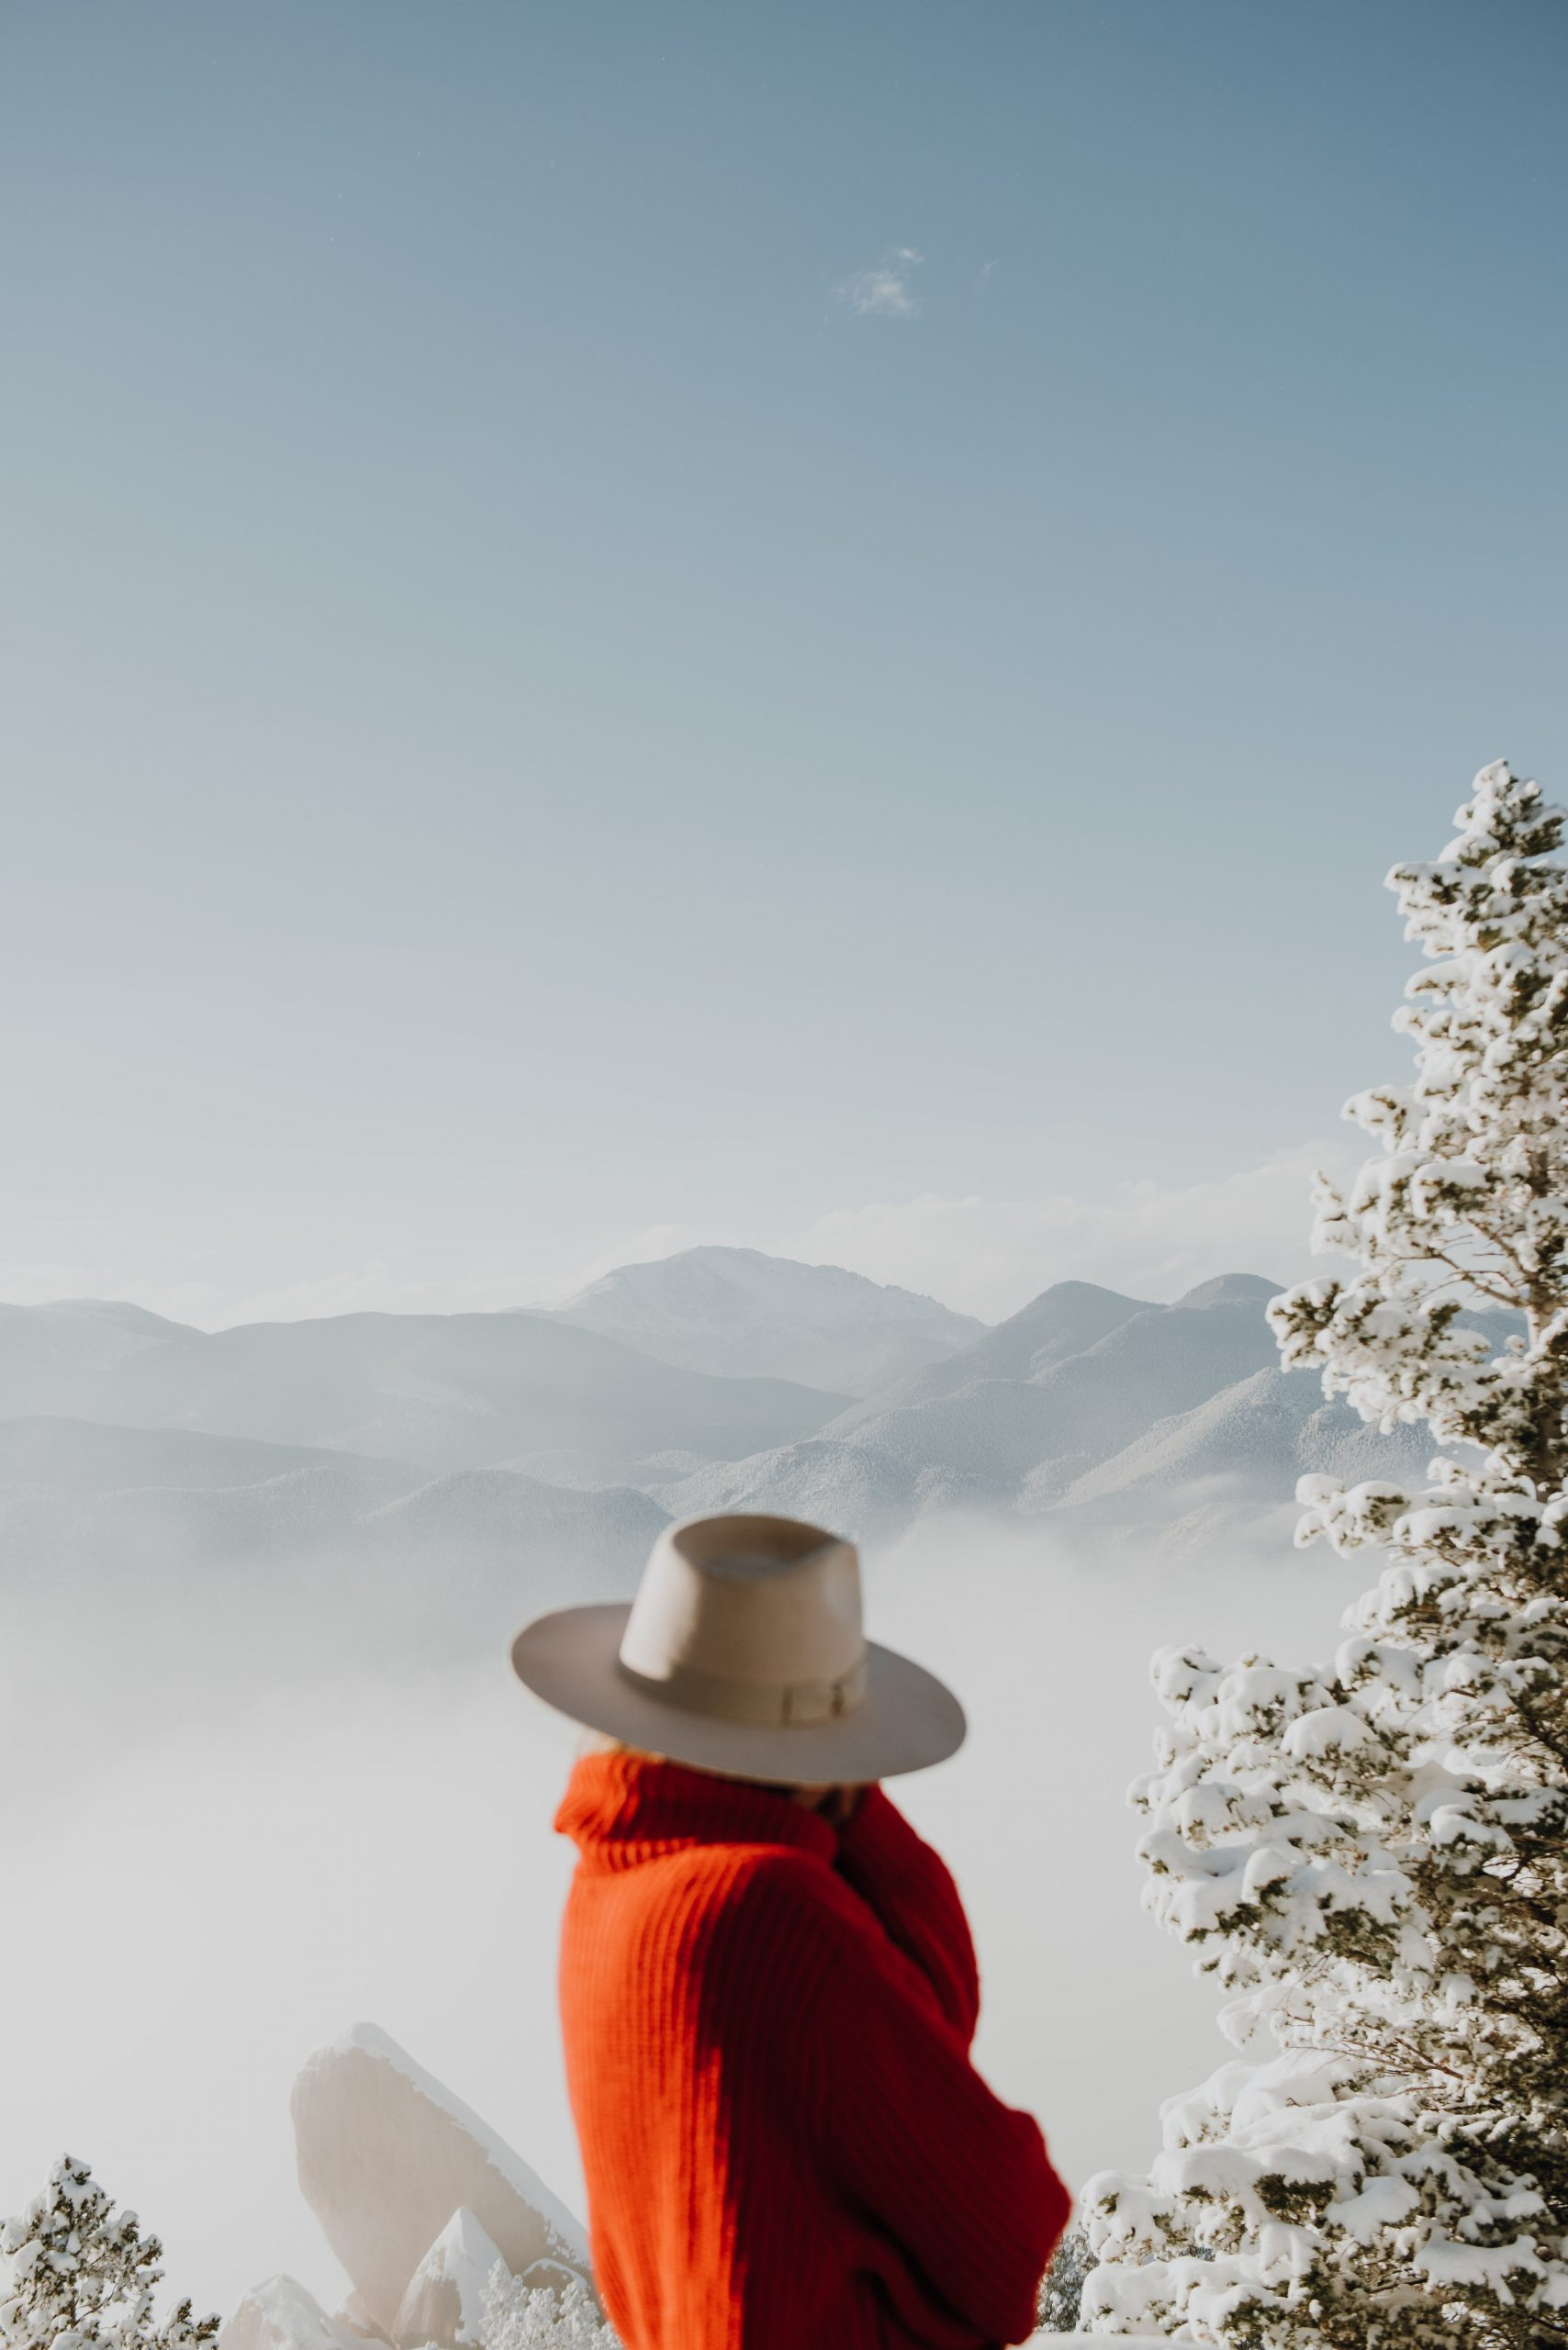 The Broadmoor cloud camp rocky mountain views